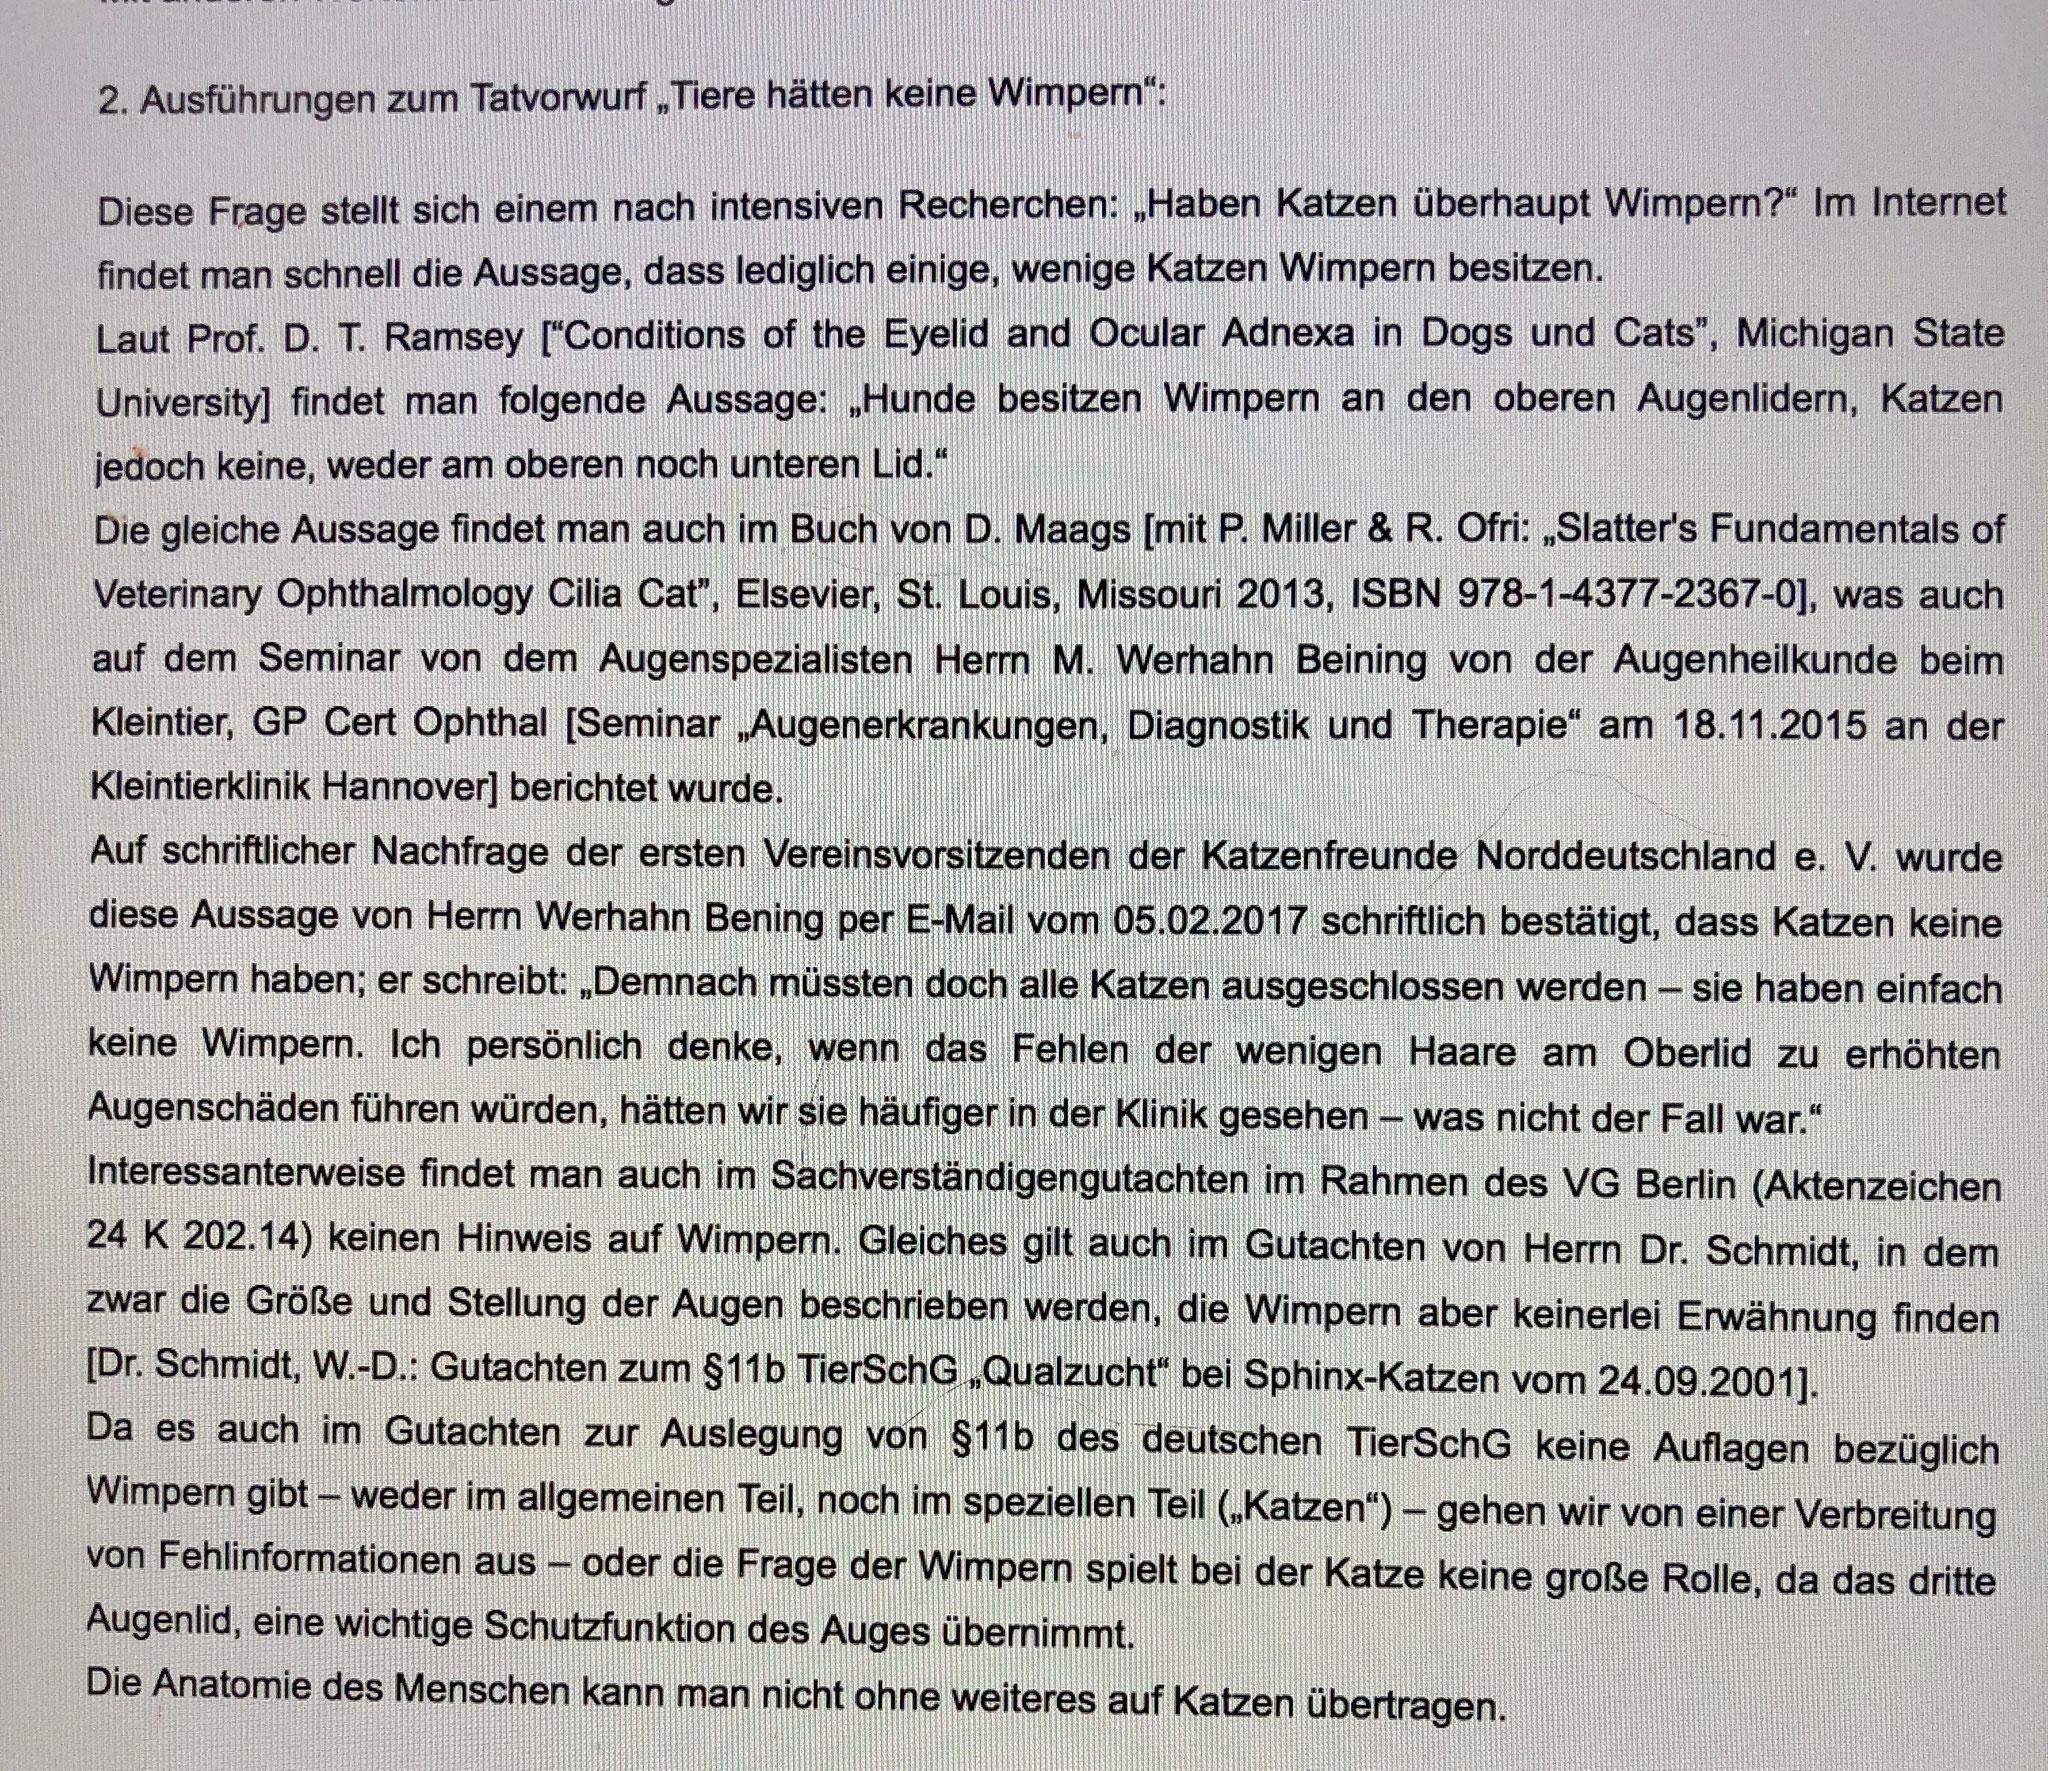 Screenhot https://www.mcc-cats.de/news/zuechter-szene.html, abgerufen am 09/05/2018, Gastbeitrag von Christoph Riedel, www.nofretetes-katzen.de